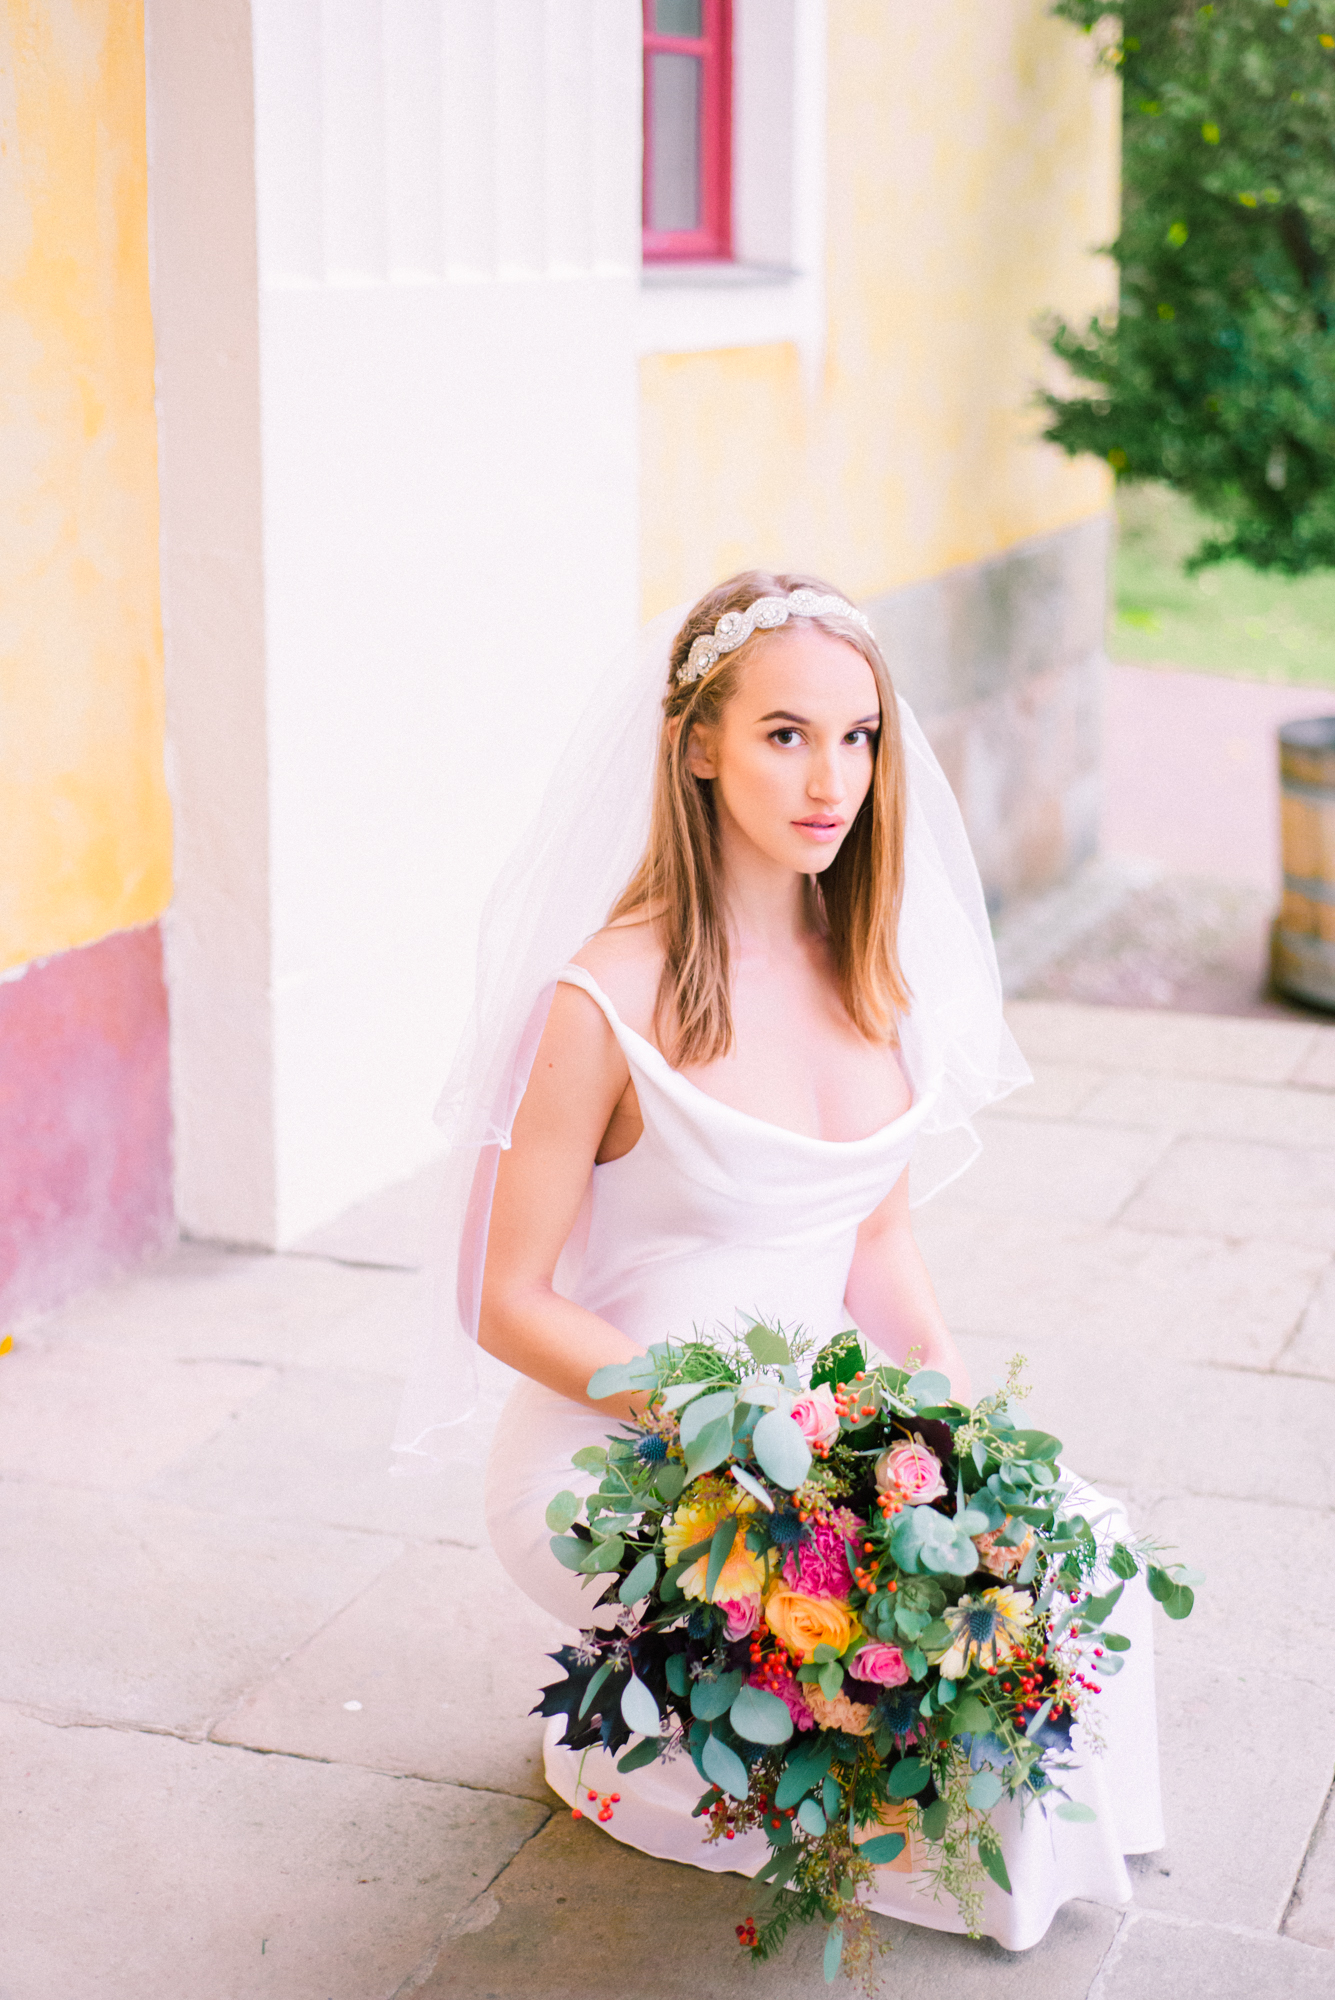 Elegant Organic Fall Swedish Bridal Wedding Styled Shoot - Erika Alvarenga Photography-102.jpg